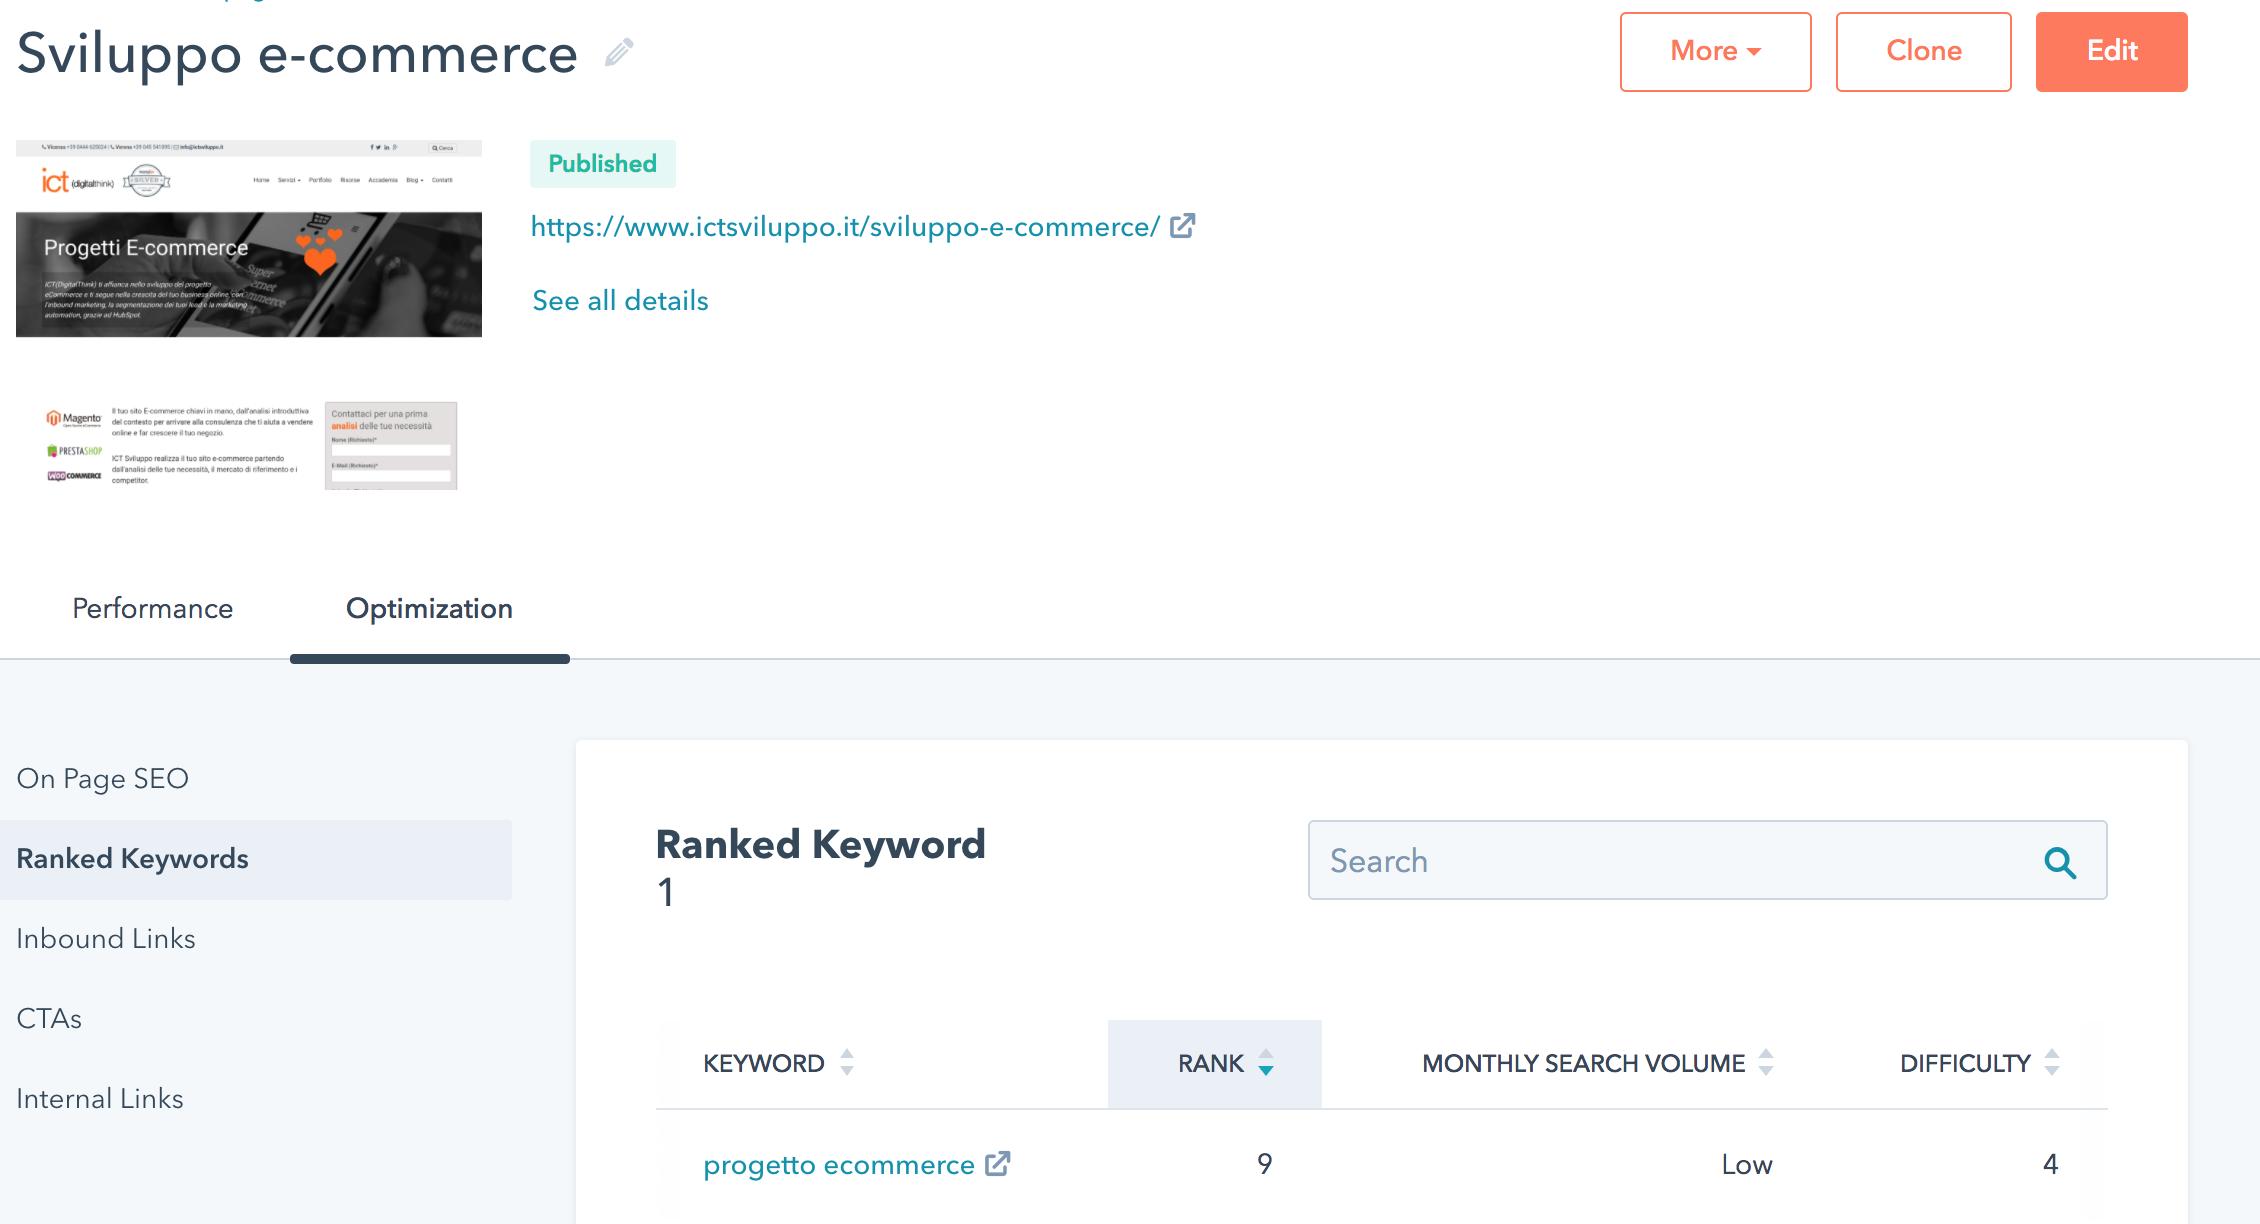 cos hubspot ranked keyword